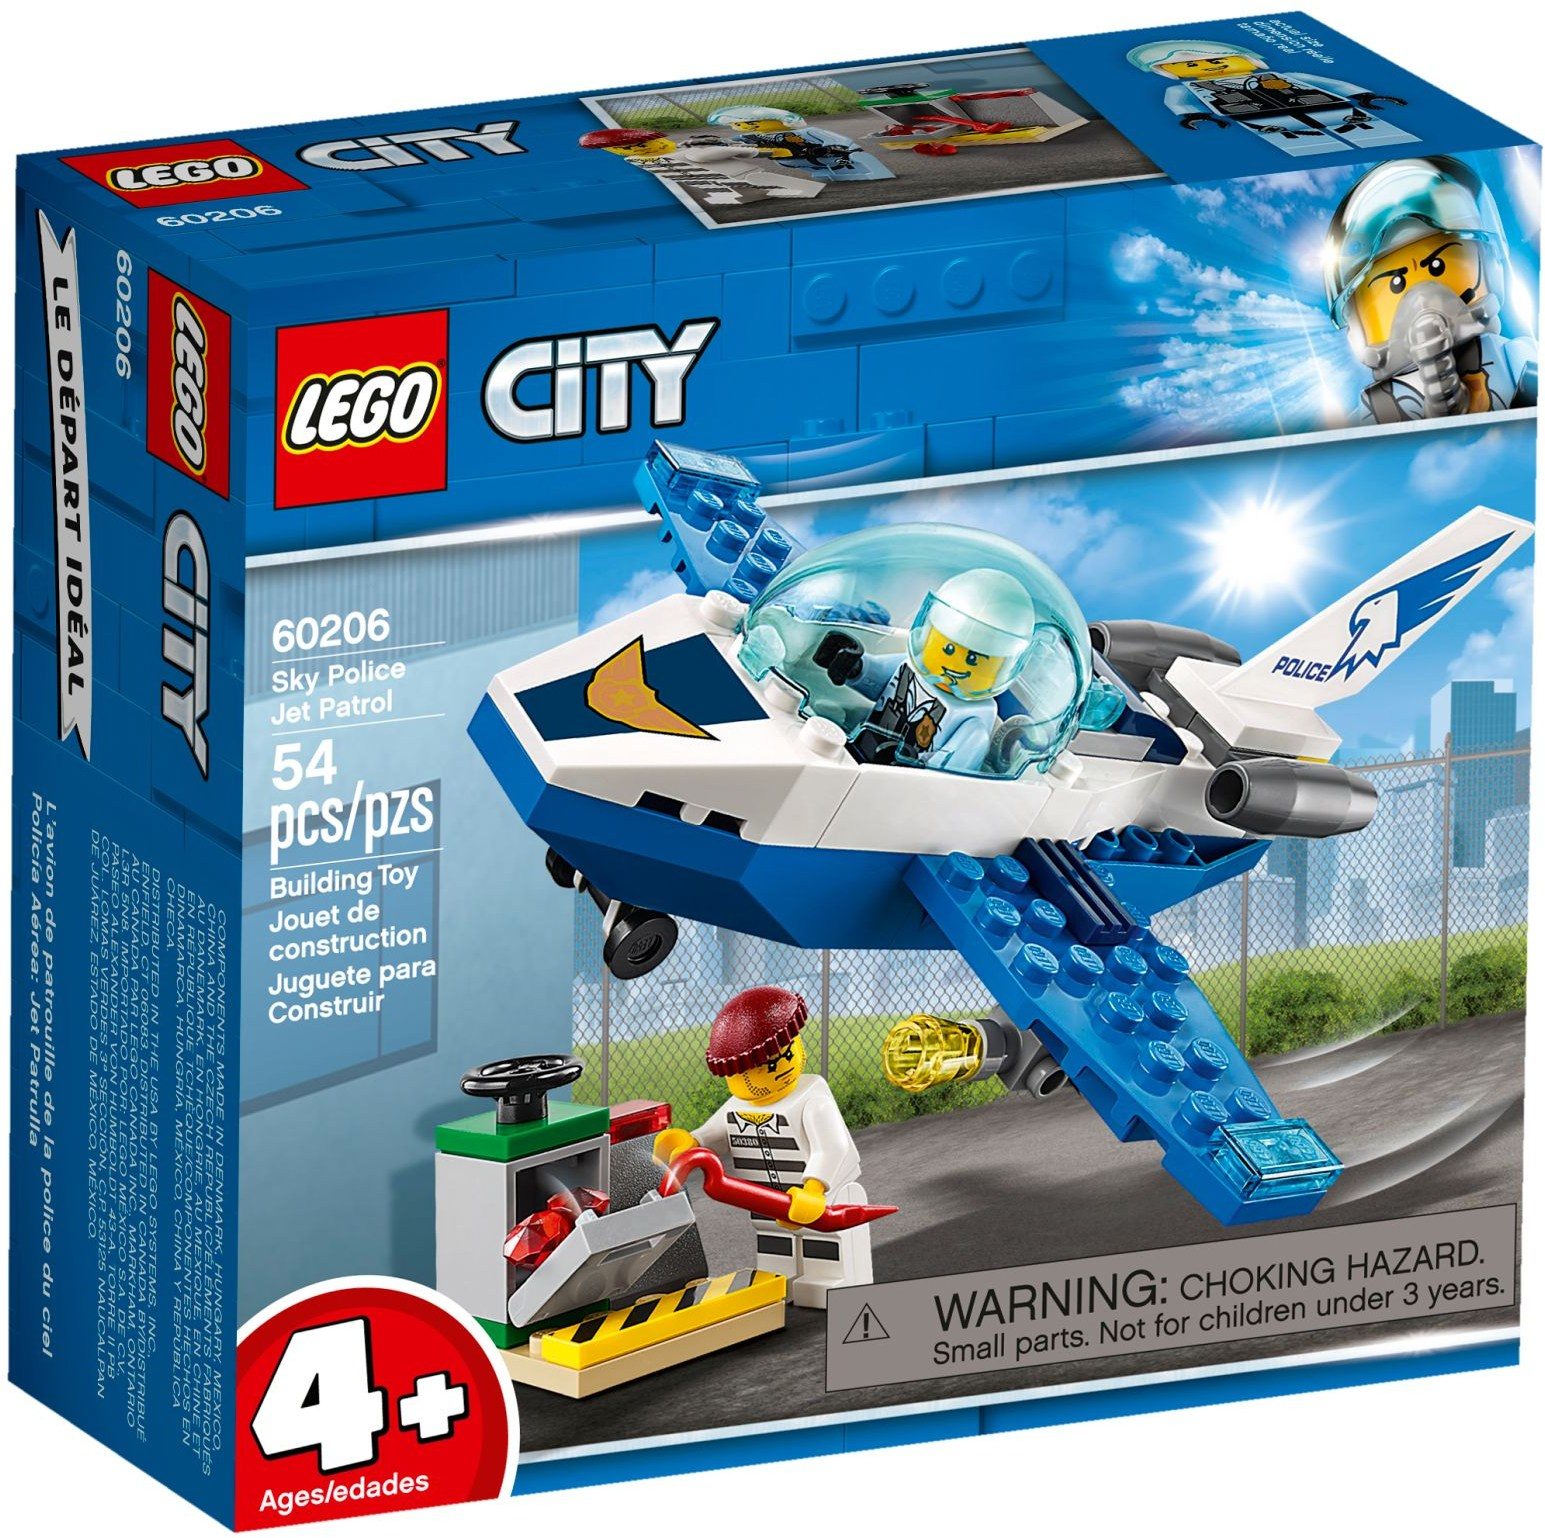 LEGO SKY POLICE JET PATROL - 60206